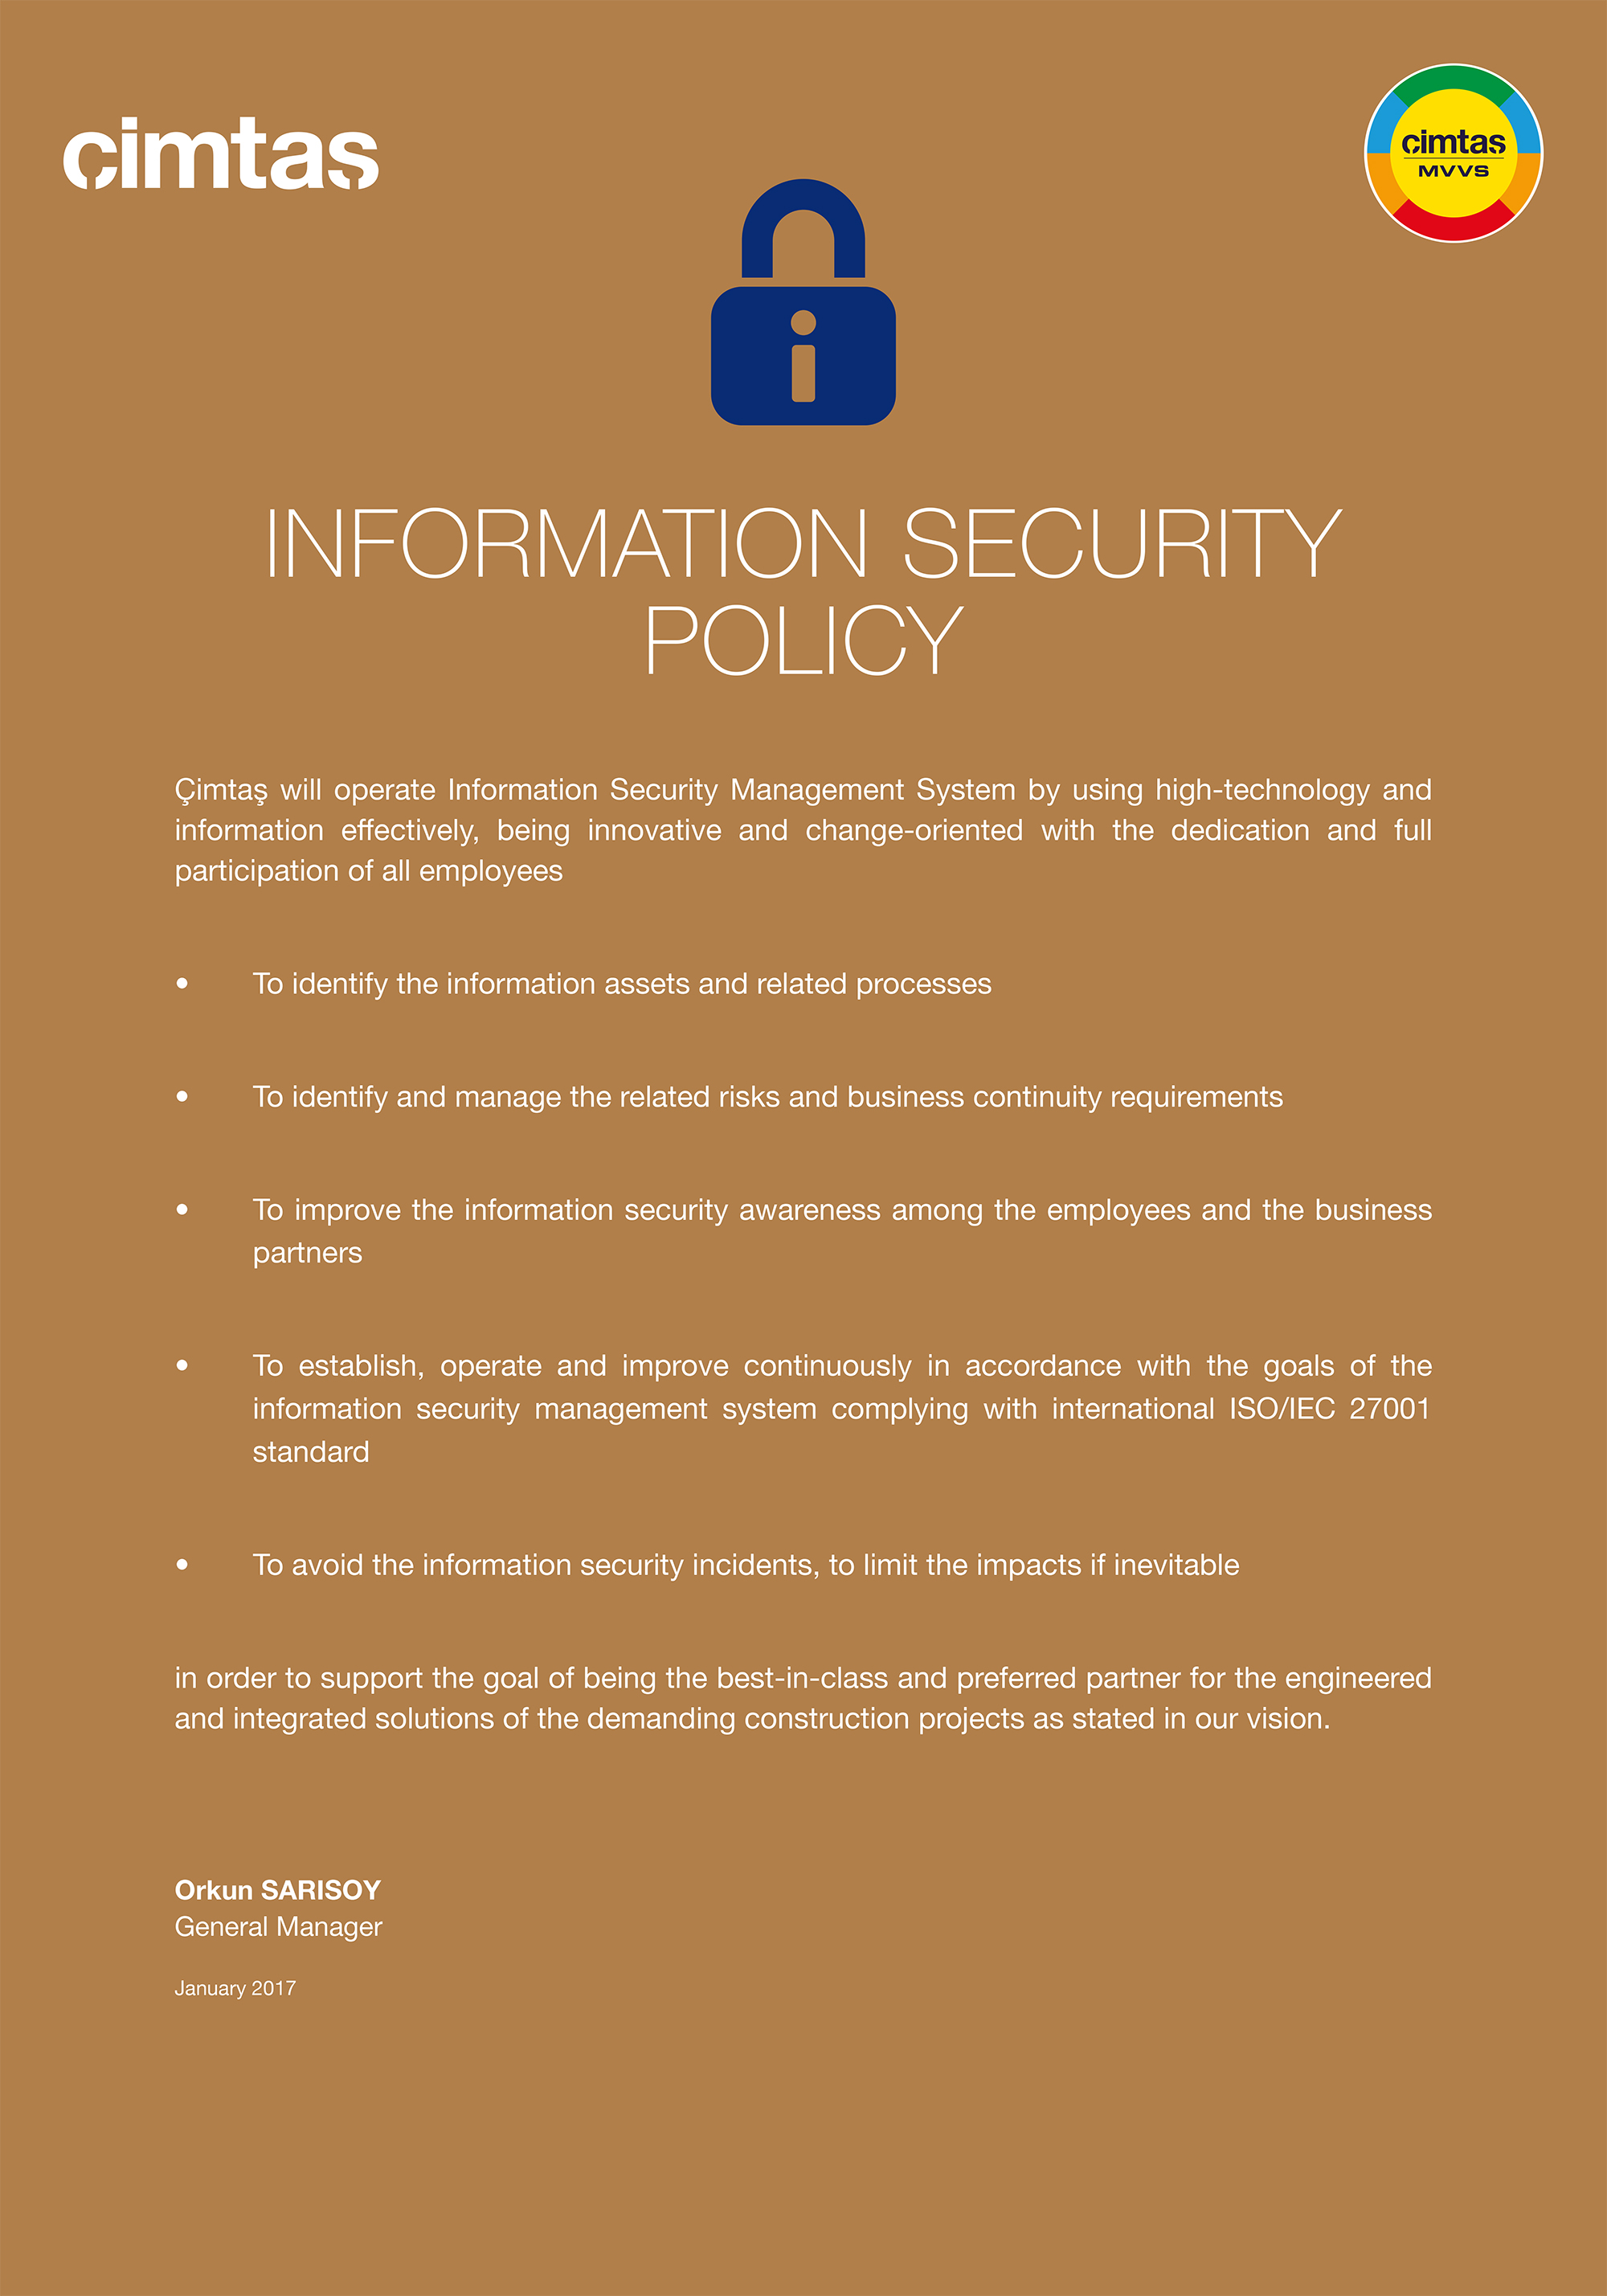 informationsecurity_poster_kahve_crossuz